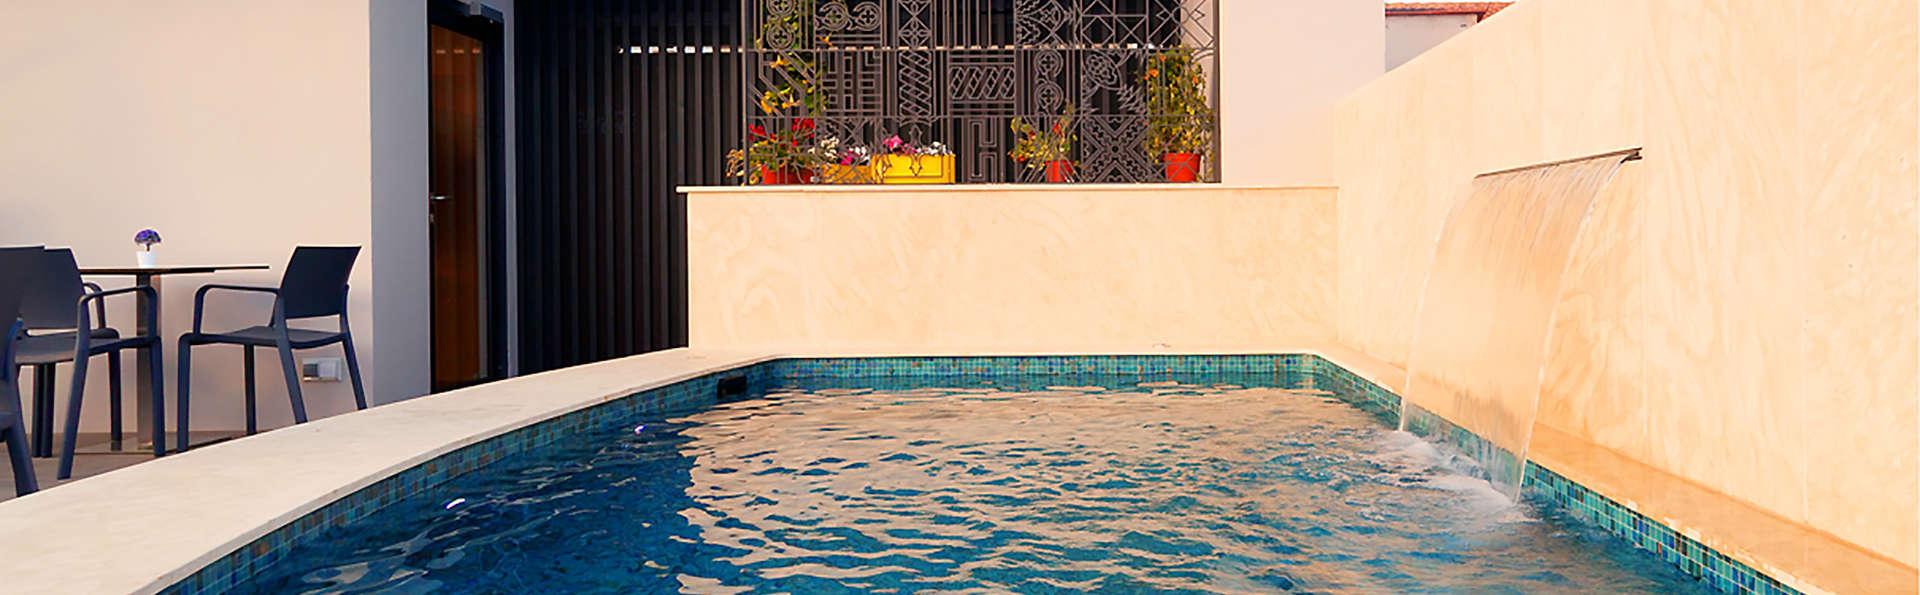 Vila Arenys Hotel - Edit_Terrace3.jpg